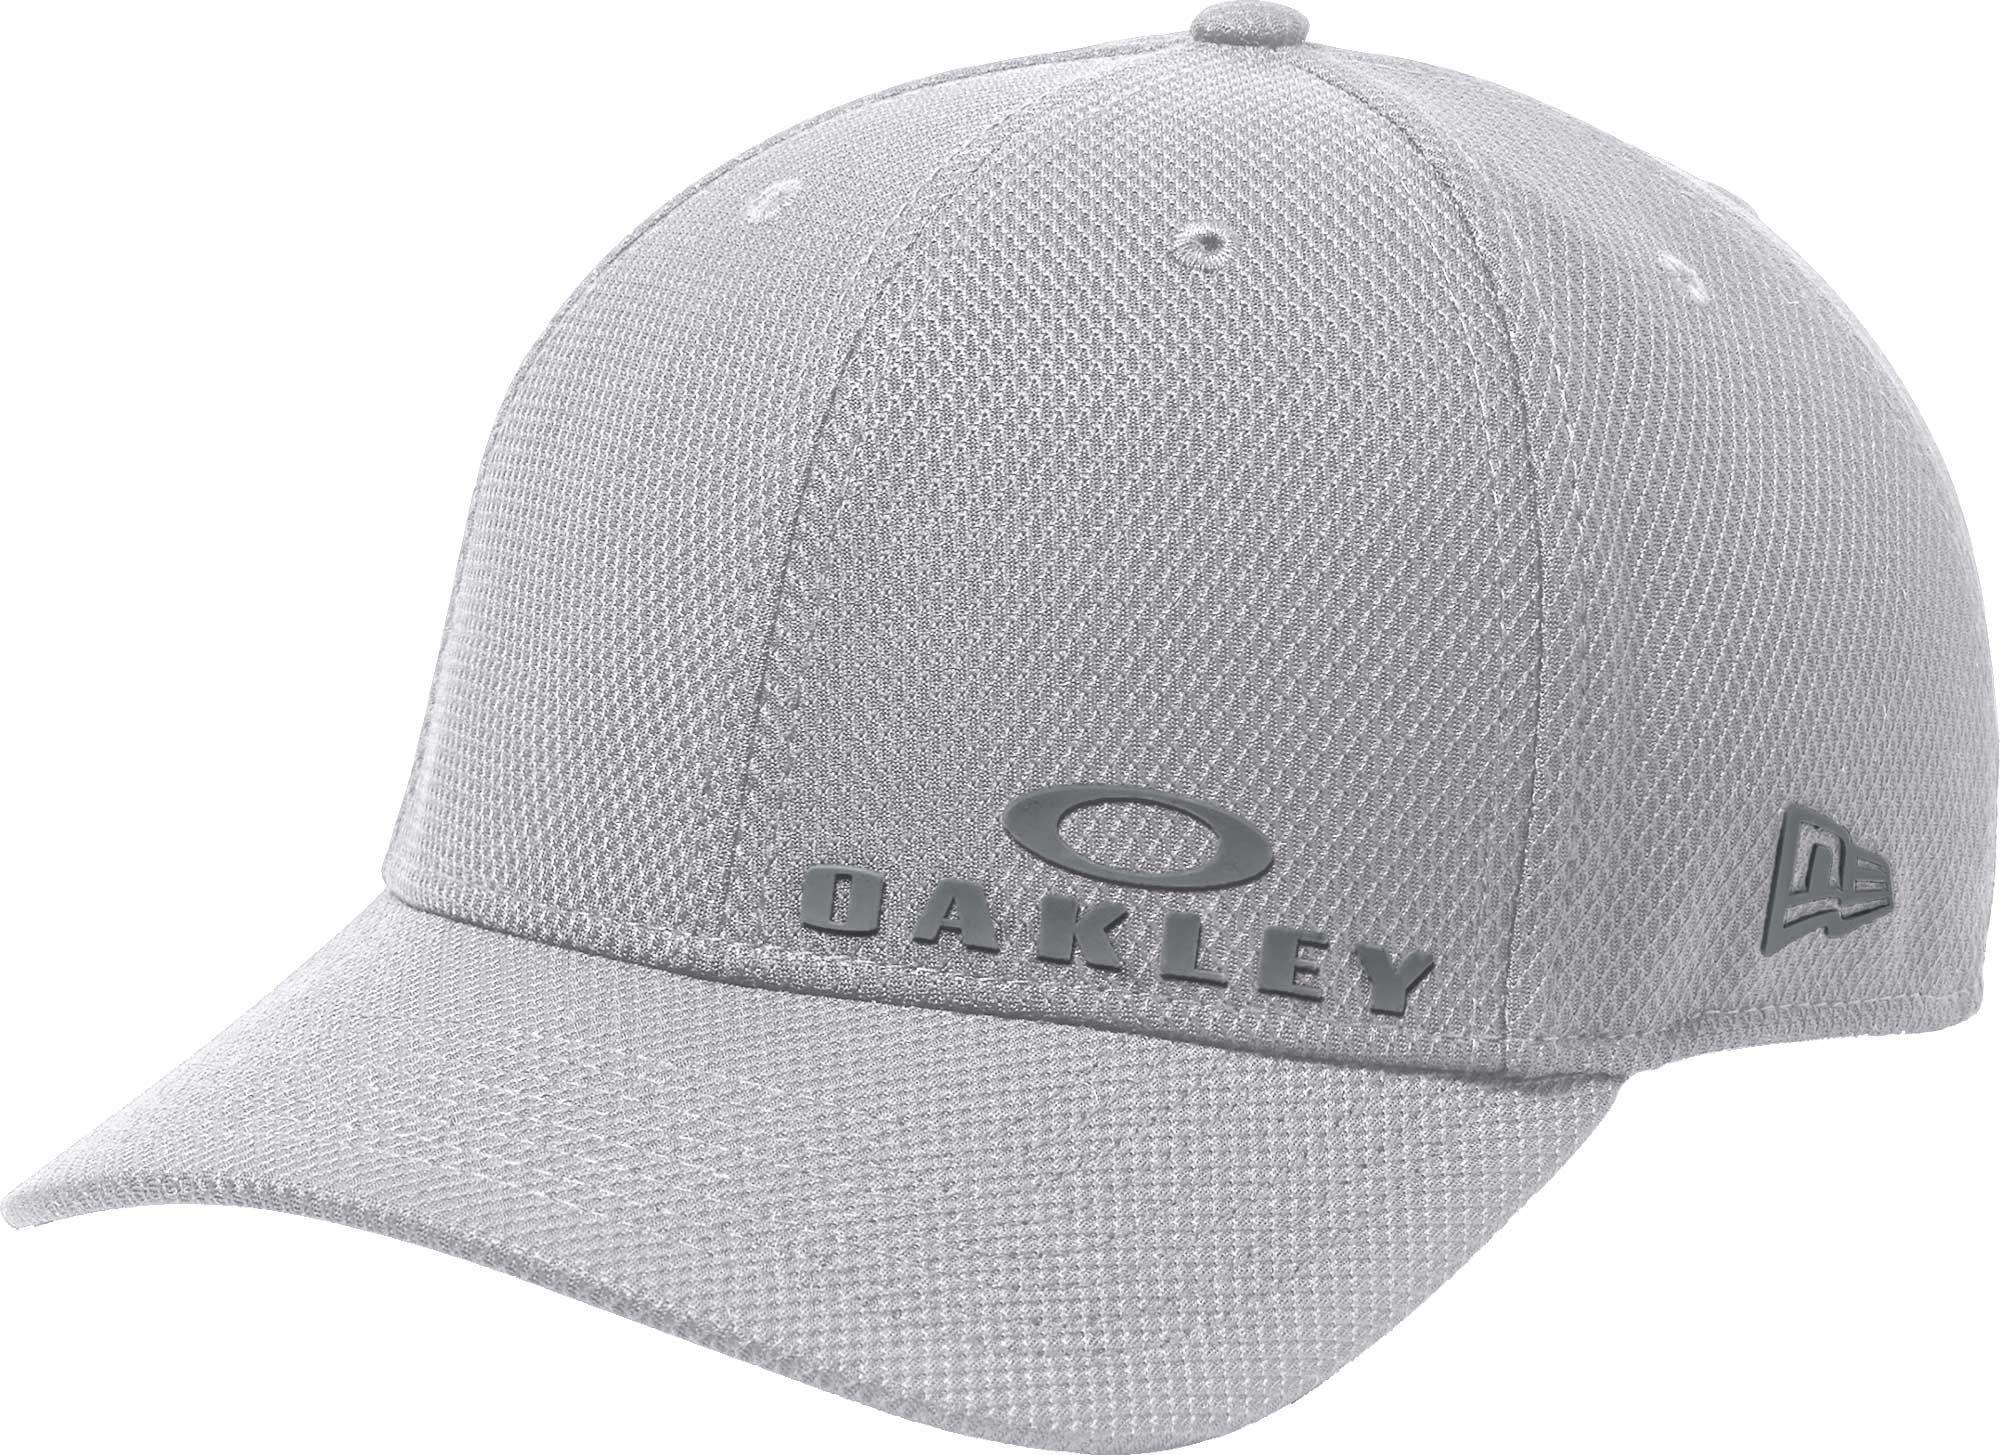 af117017819 Lyst - Oakley Diamond New Era Golf Hat in Gray for Men